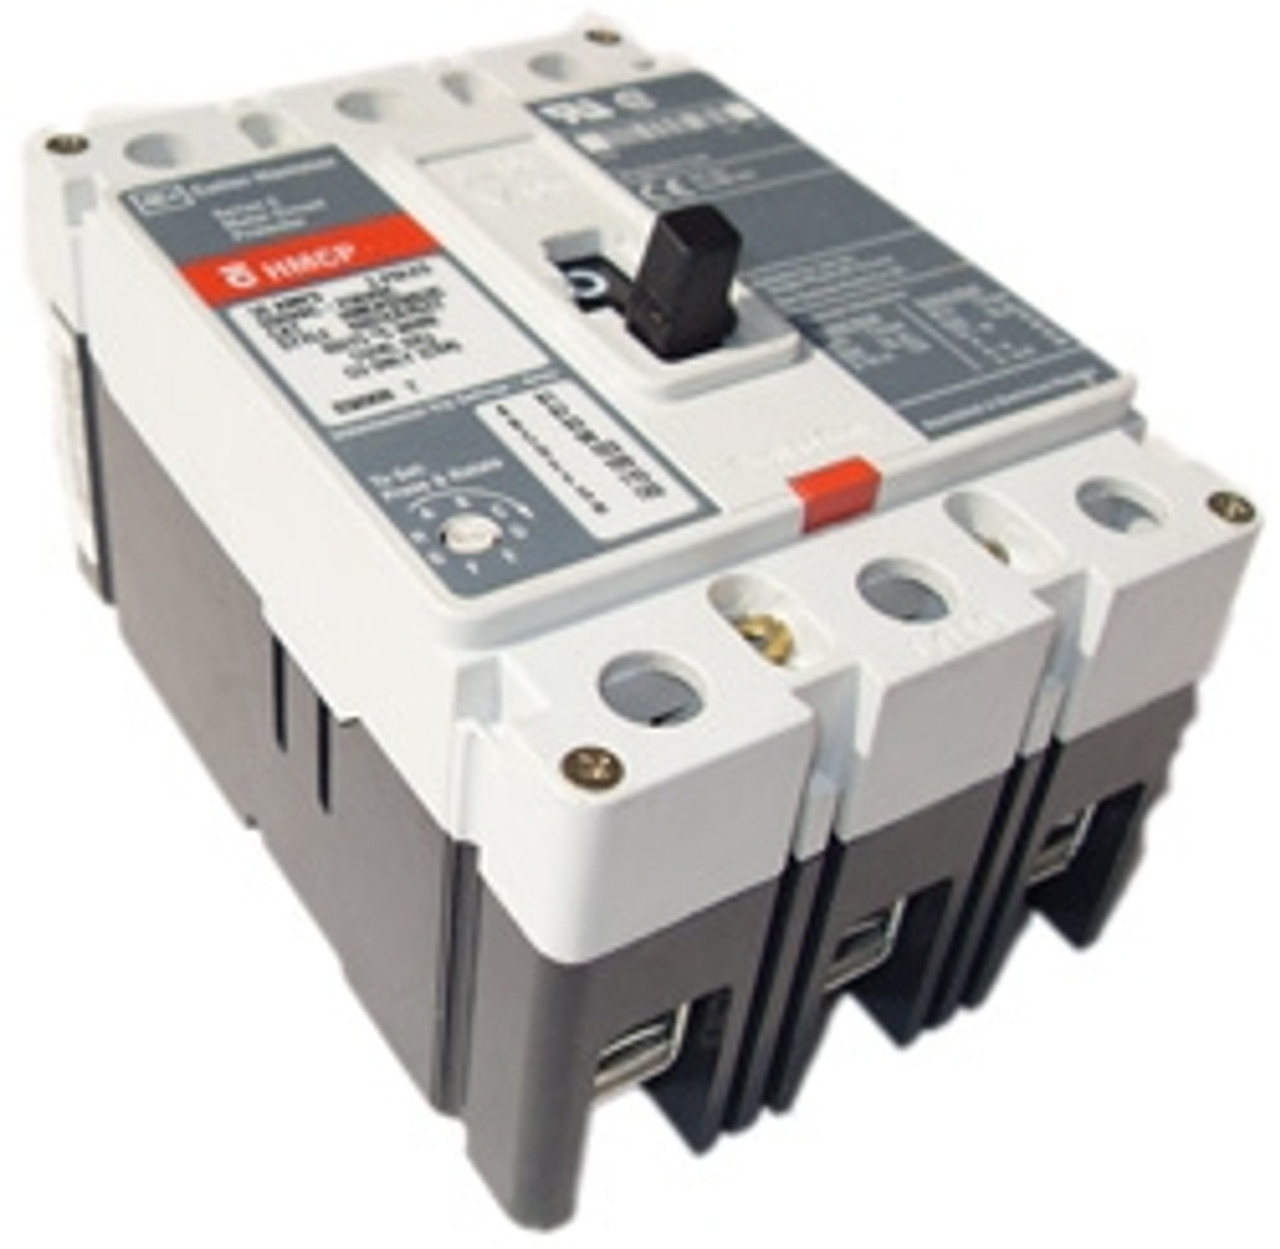 Westinghouse HMCP2505C 3 Pole 250A 600V (450-900) Circuit Breaker - Used